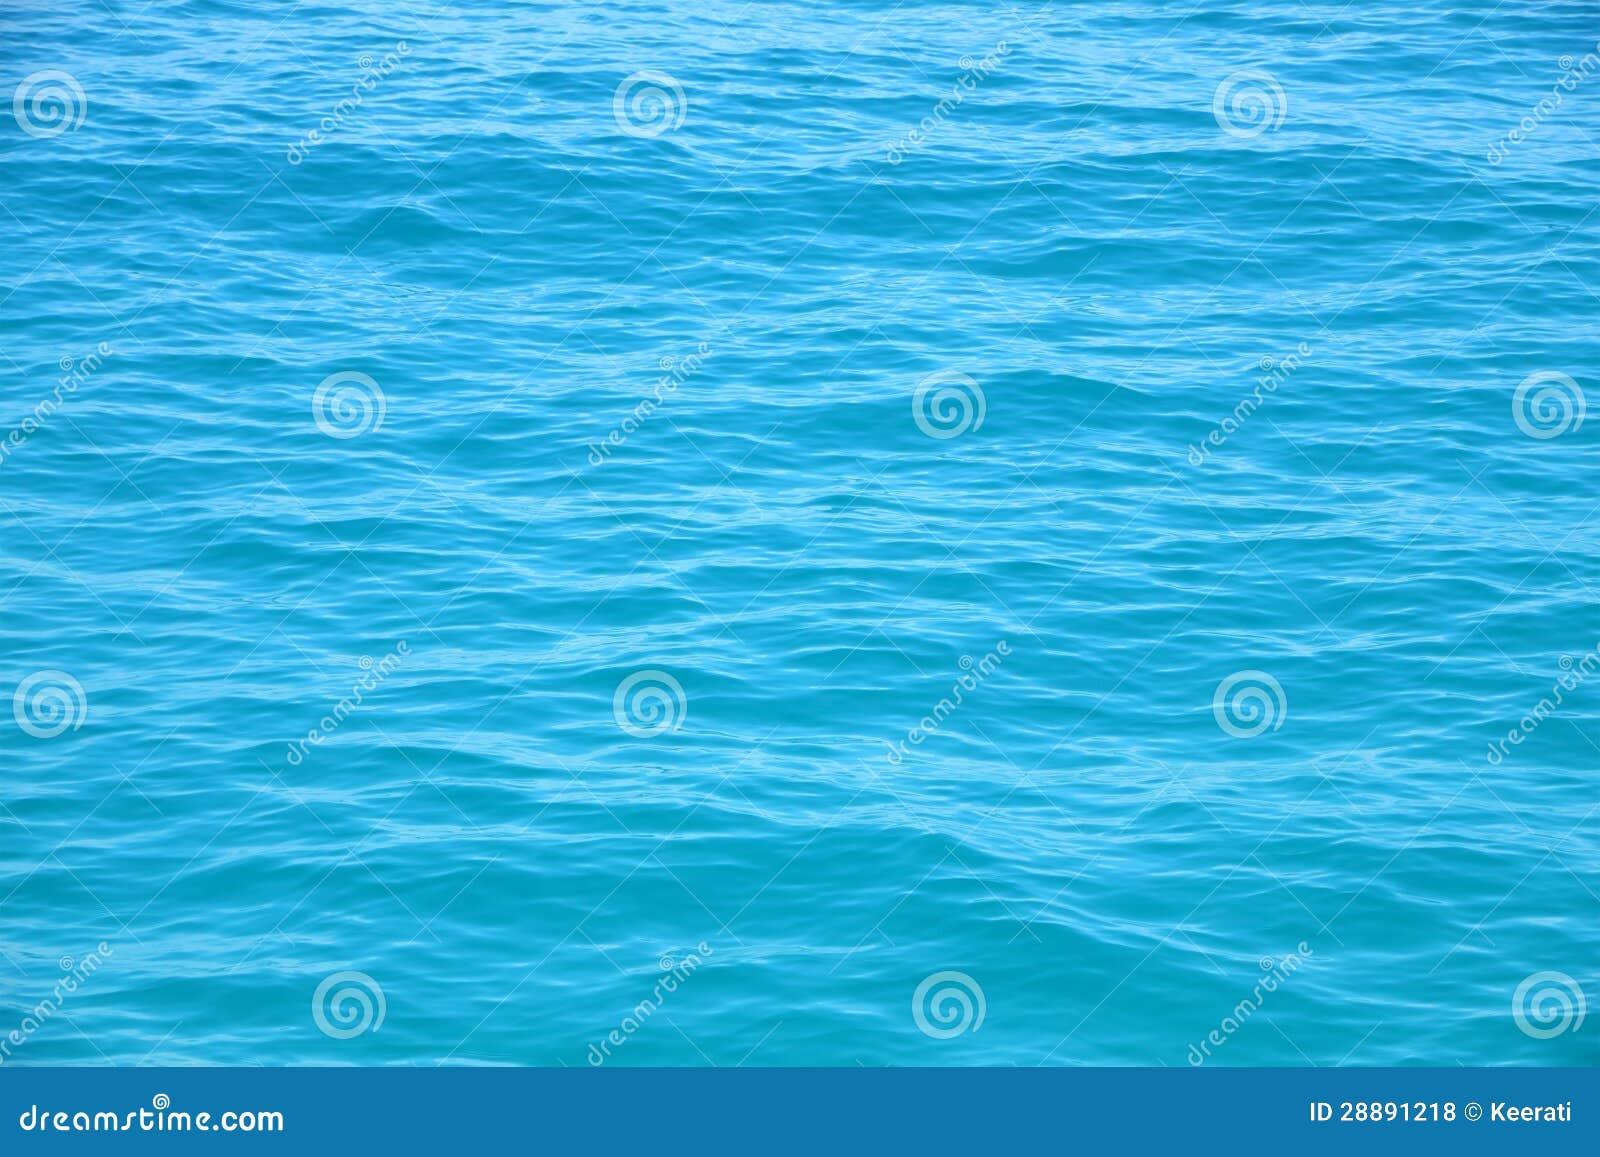 1366x768 blue sea surface - photo #31